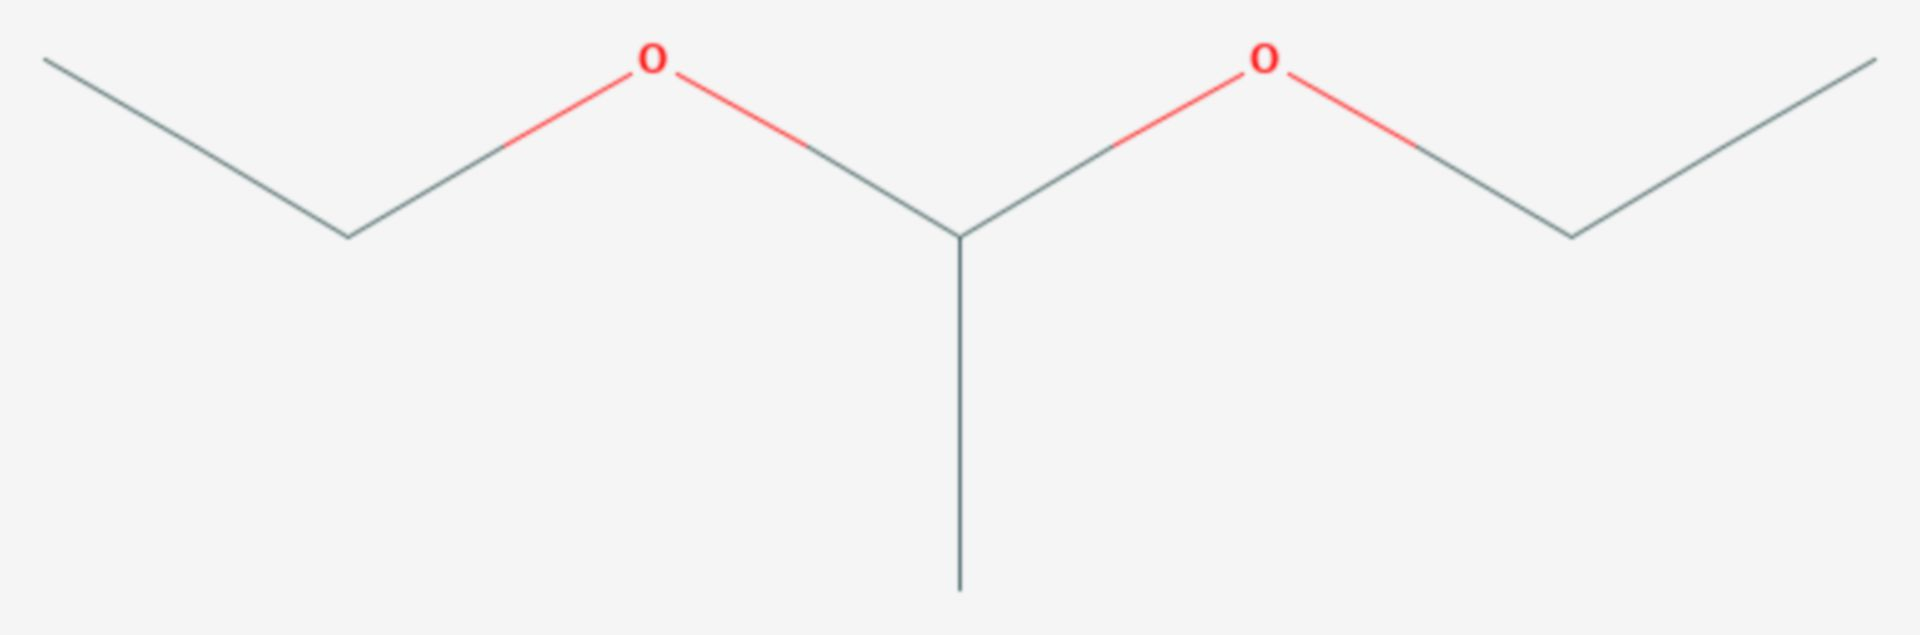 Acetaldehyddiethylacetal (Strukturformel)